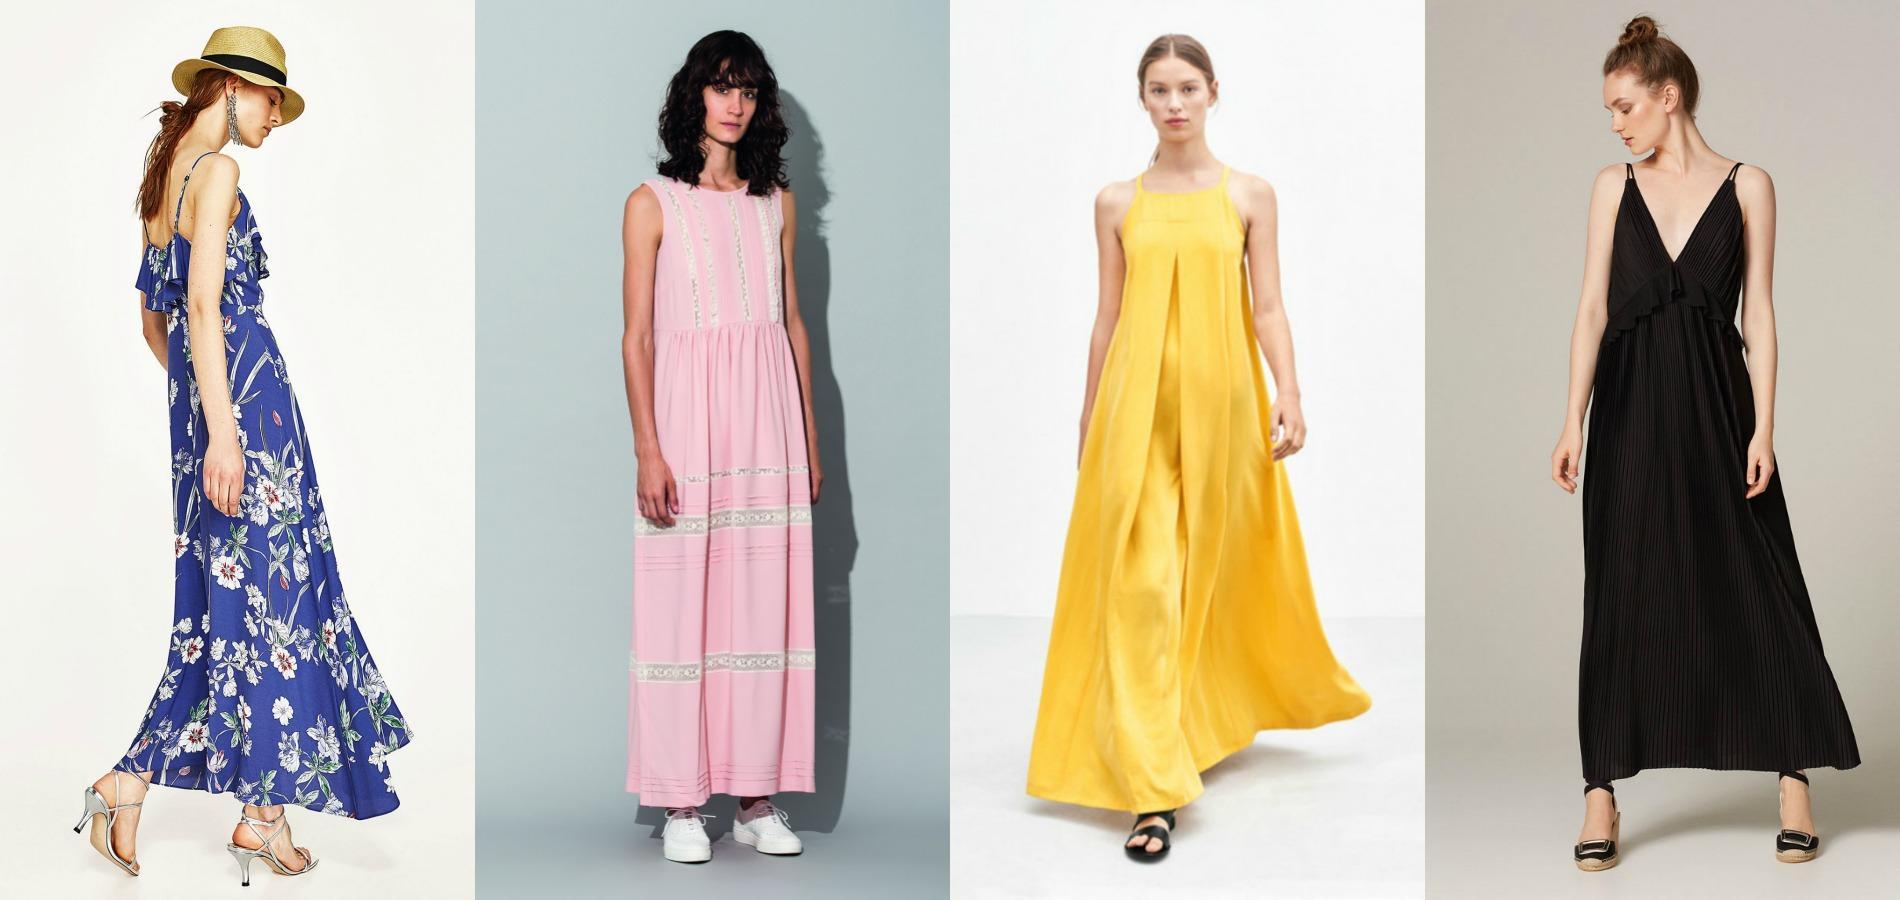 abb9a6fe371c Comment porter une robe longue quand on est petite   - Madame Figaro